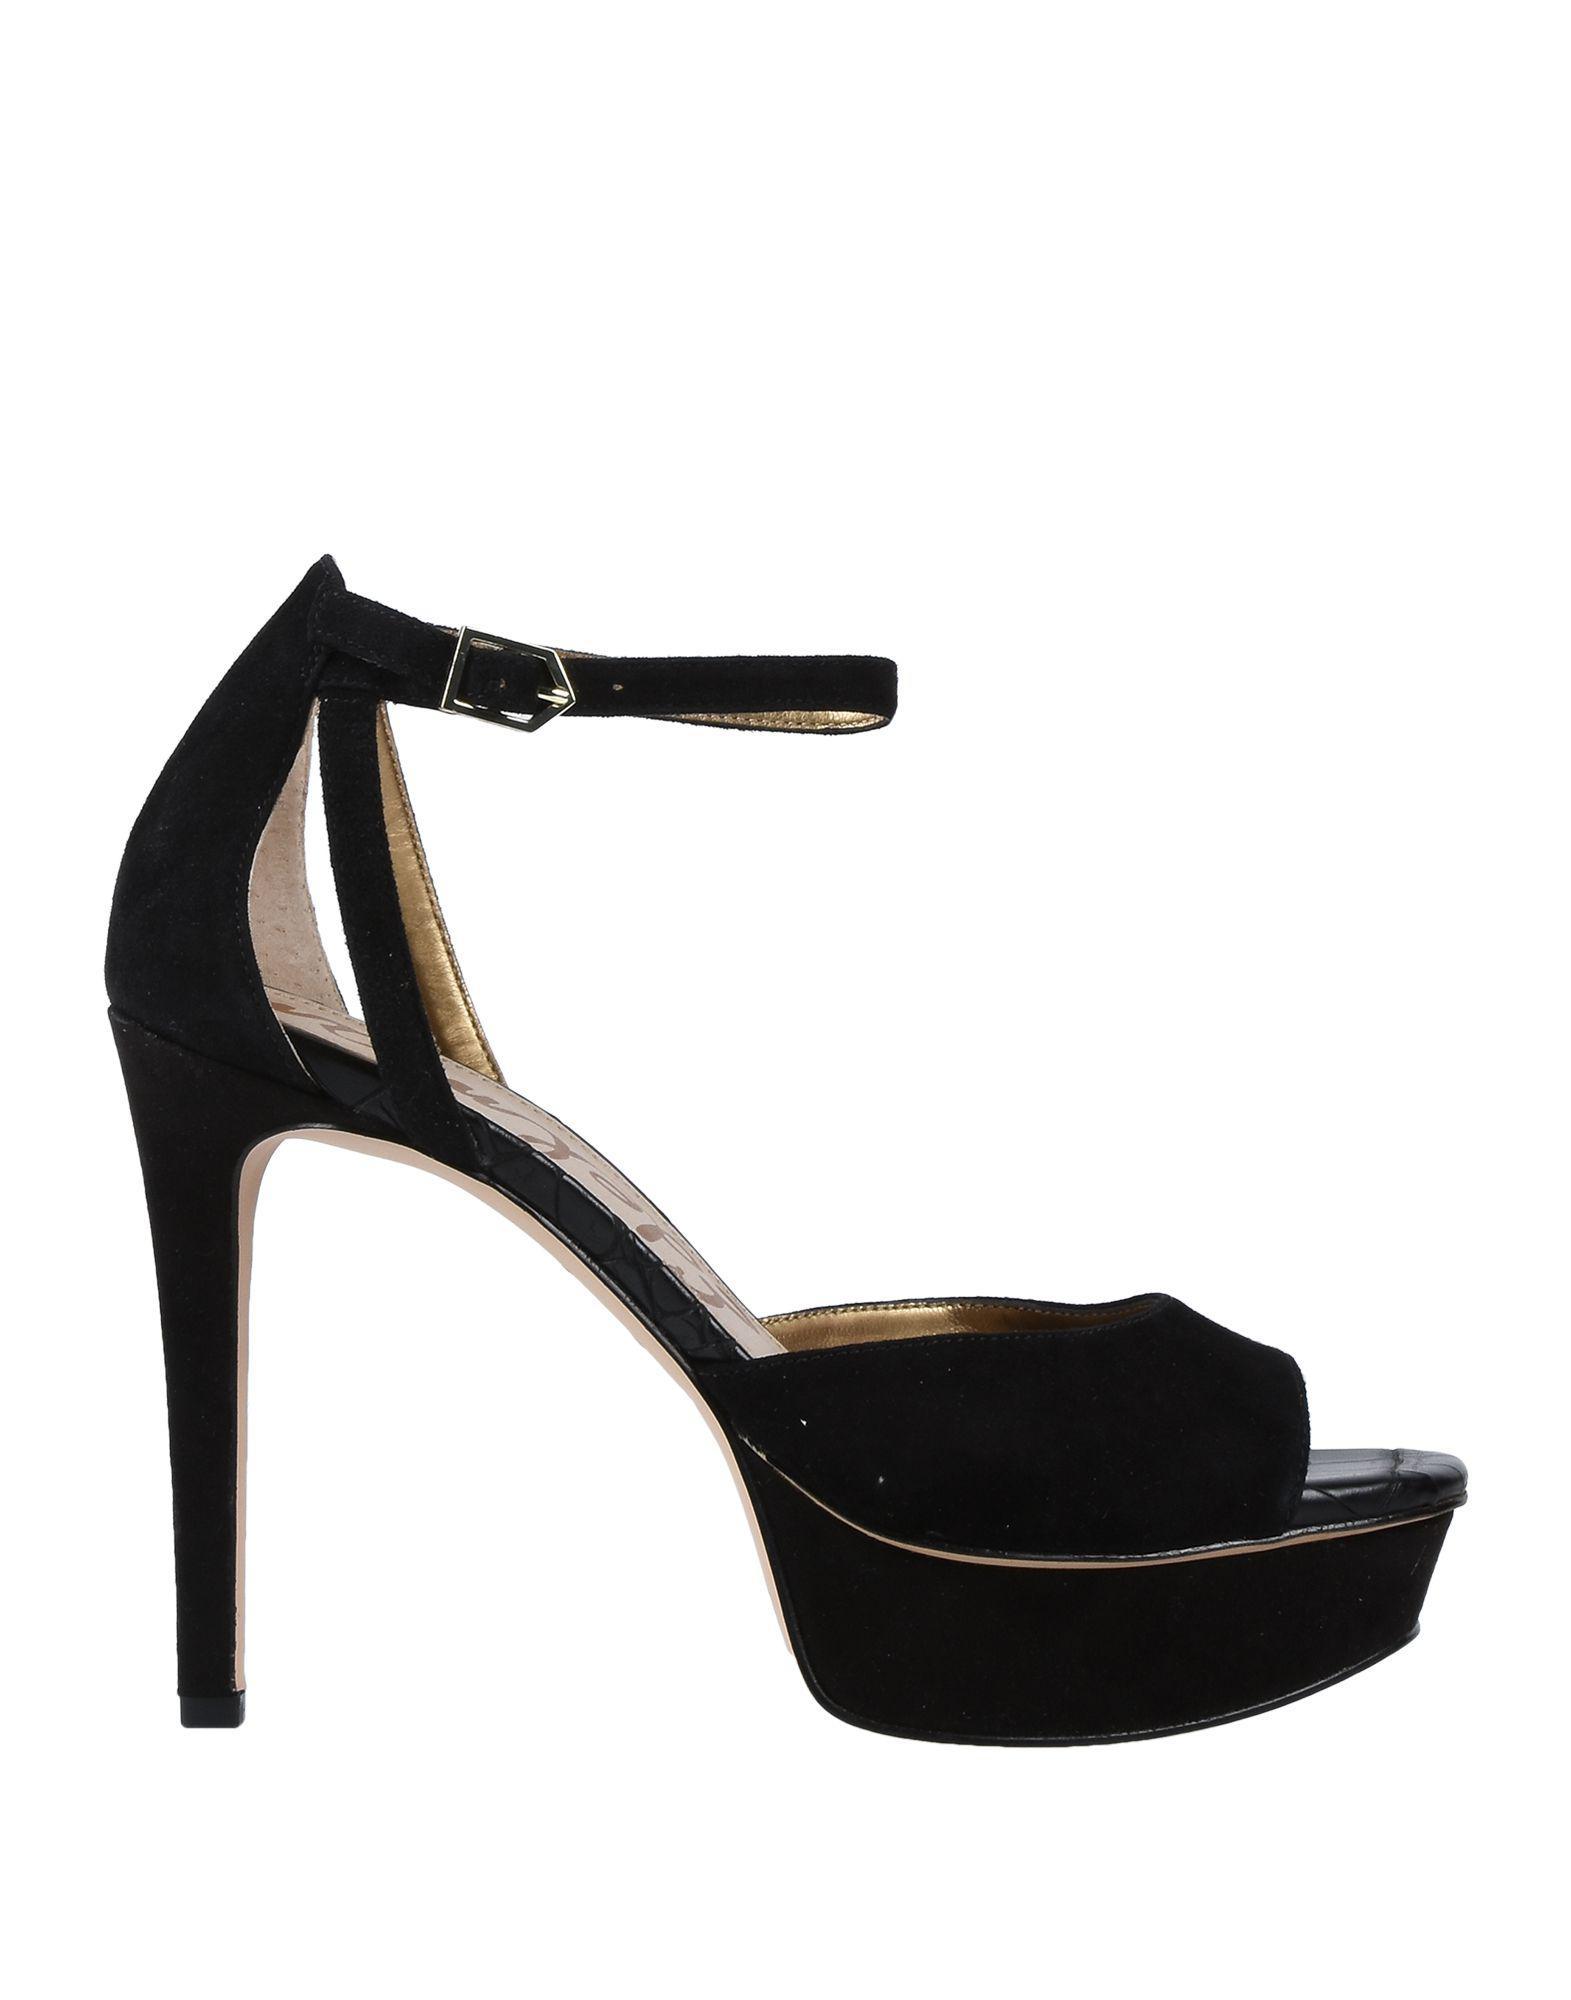 de8fbbee99e062 Lyst - Sam Edelman Sandals in Black